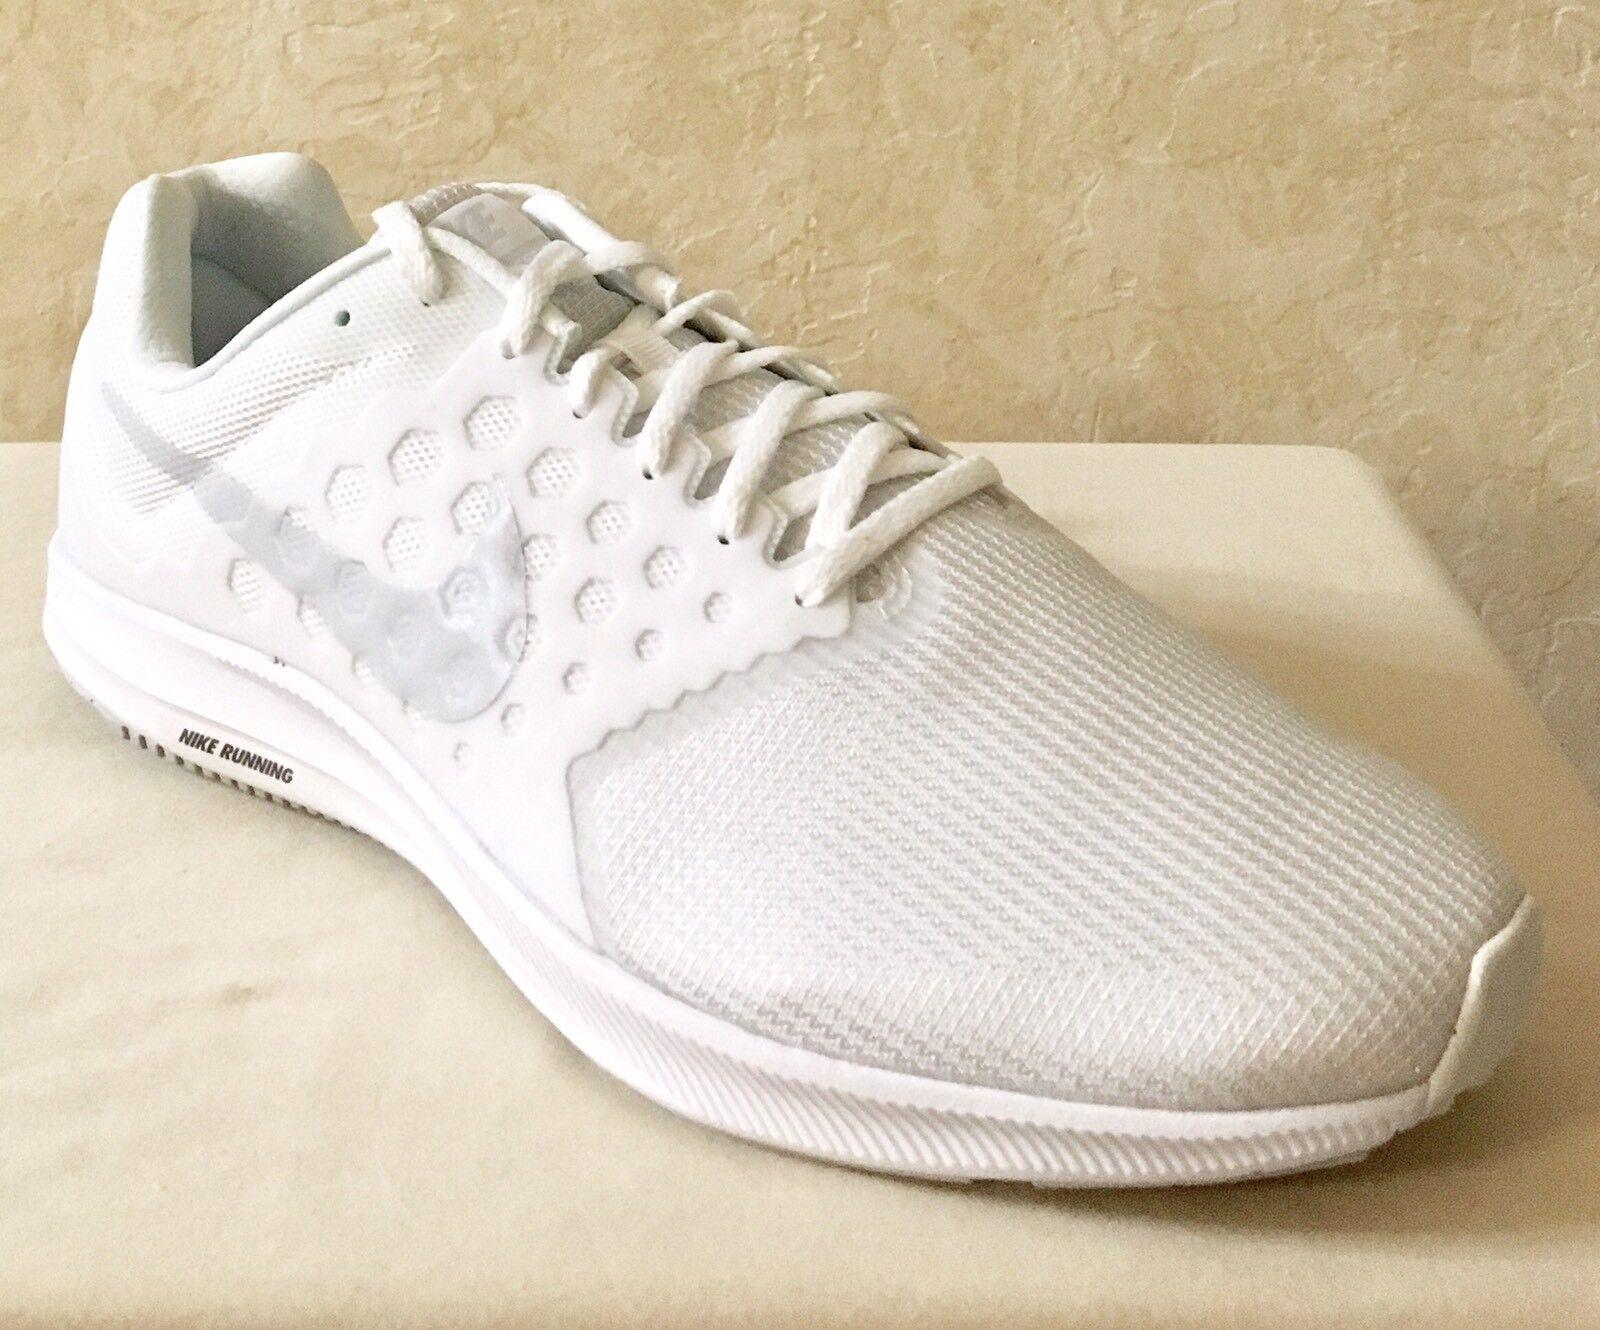 Men Nike Downshifter 7 (4E) Running/Lifestyle Shoes White Platinum 852460-100